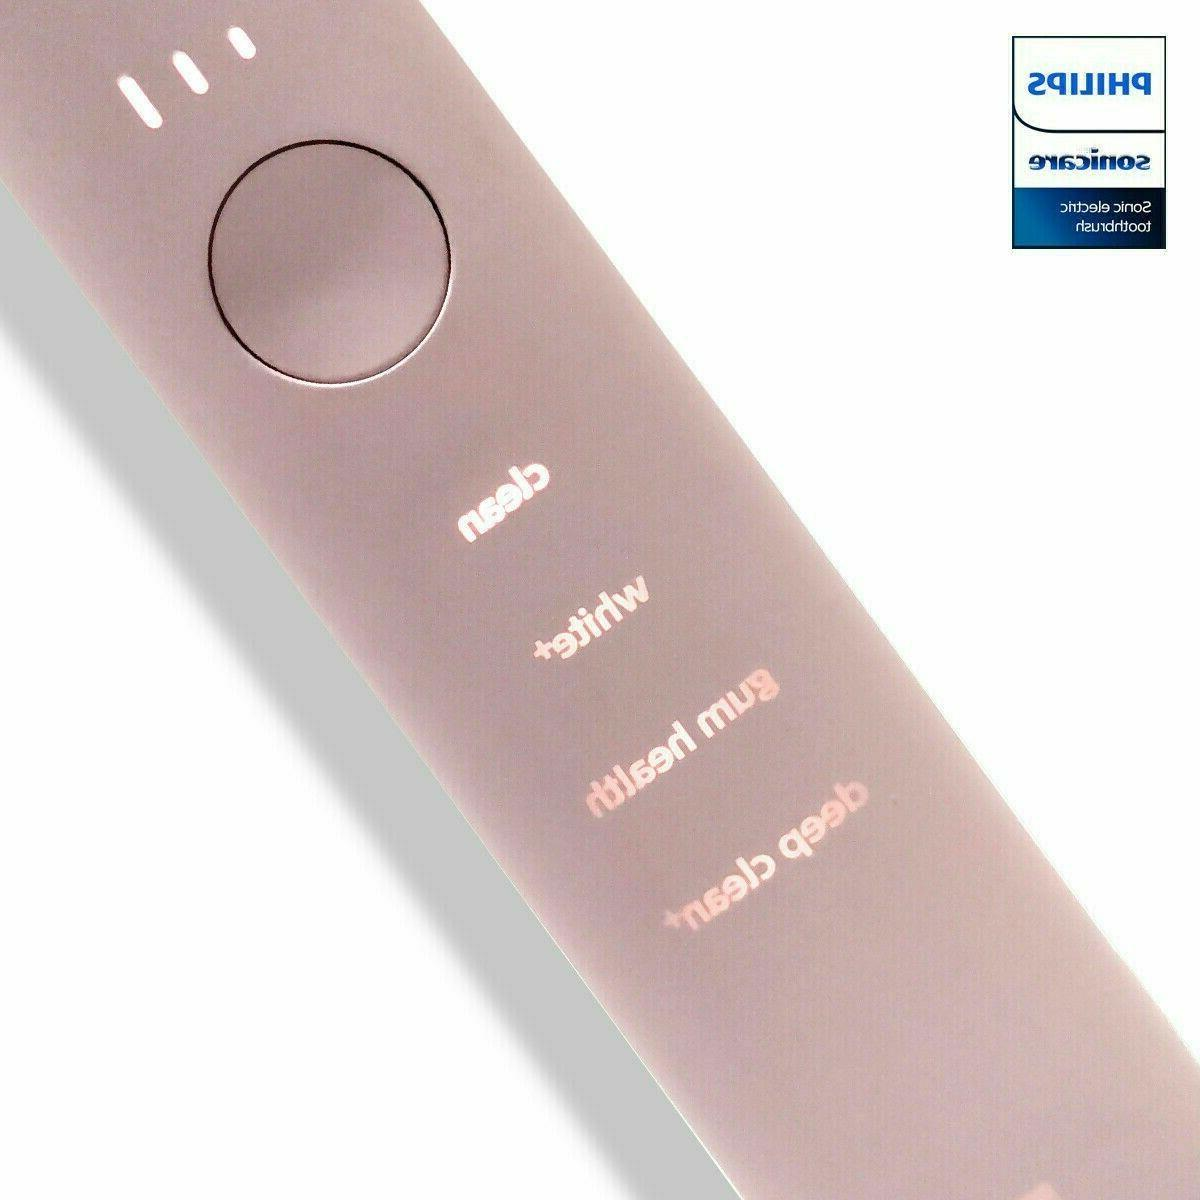 Philips Smart HX992P/HX9362/68 Handle Pink